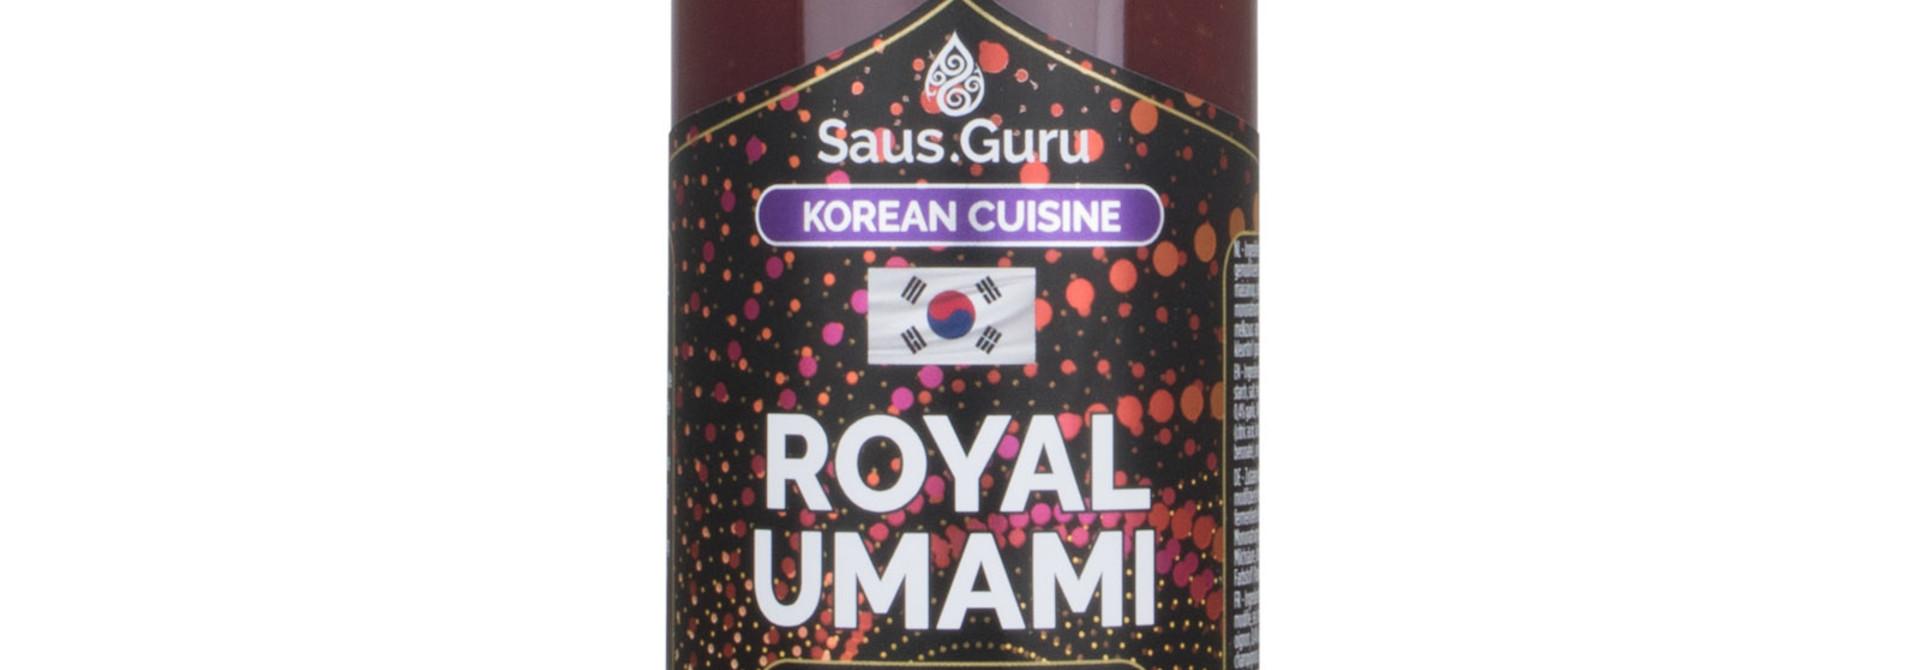 Saus.Guru's Royal Umami